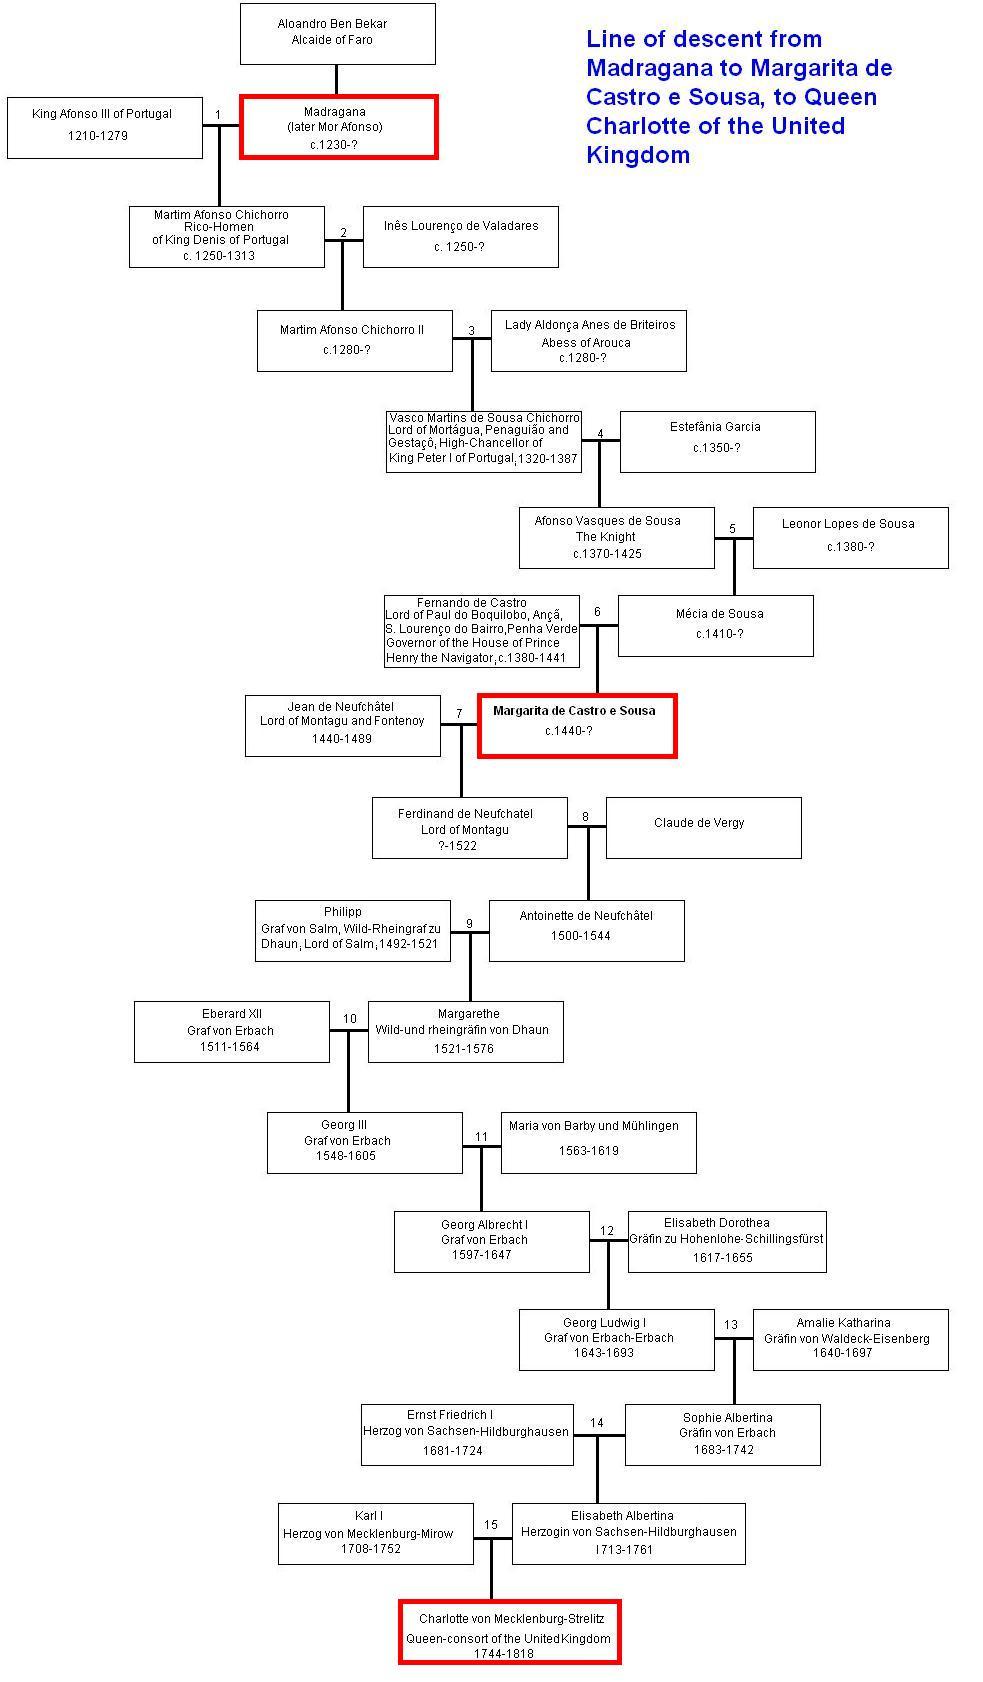 margarita_de_castro_e_souza_genealogy_and_descent.jpg